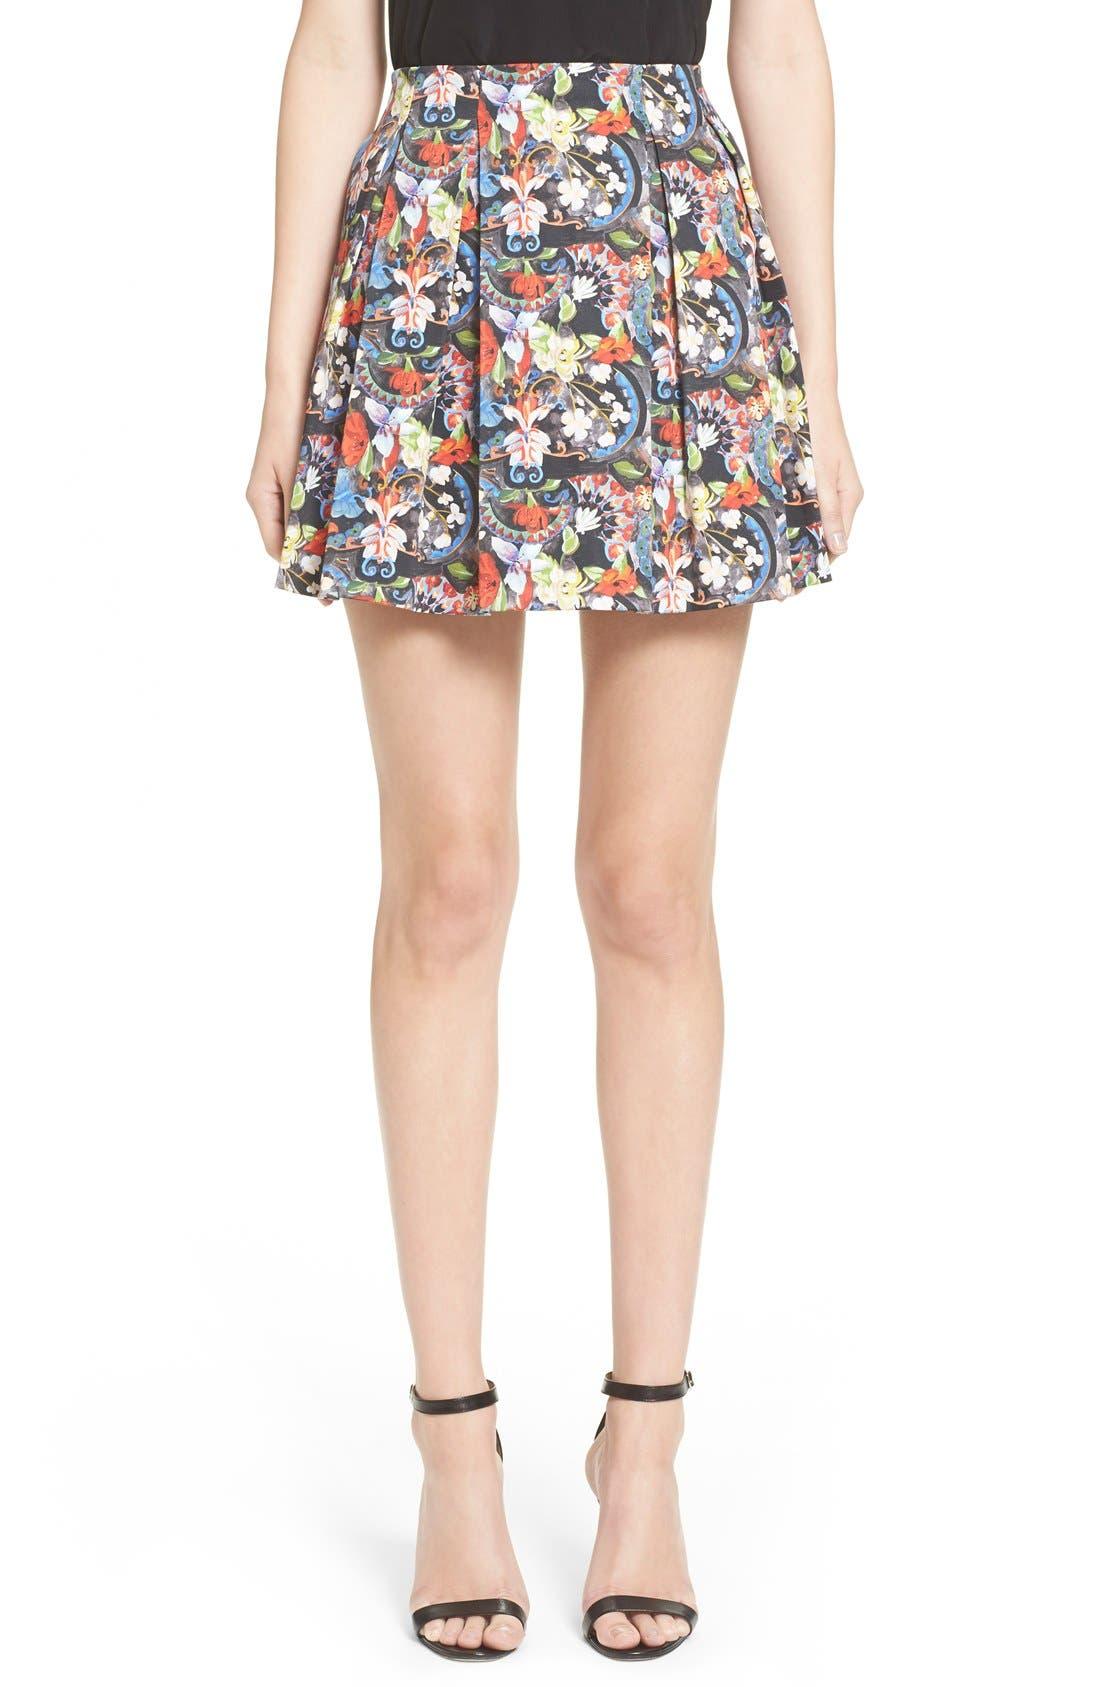 ALICE + OLIVIA 'Parson' Floral Print Pleated Miniskirt, Main, color, 605